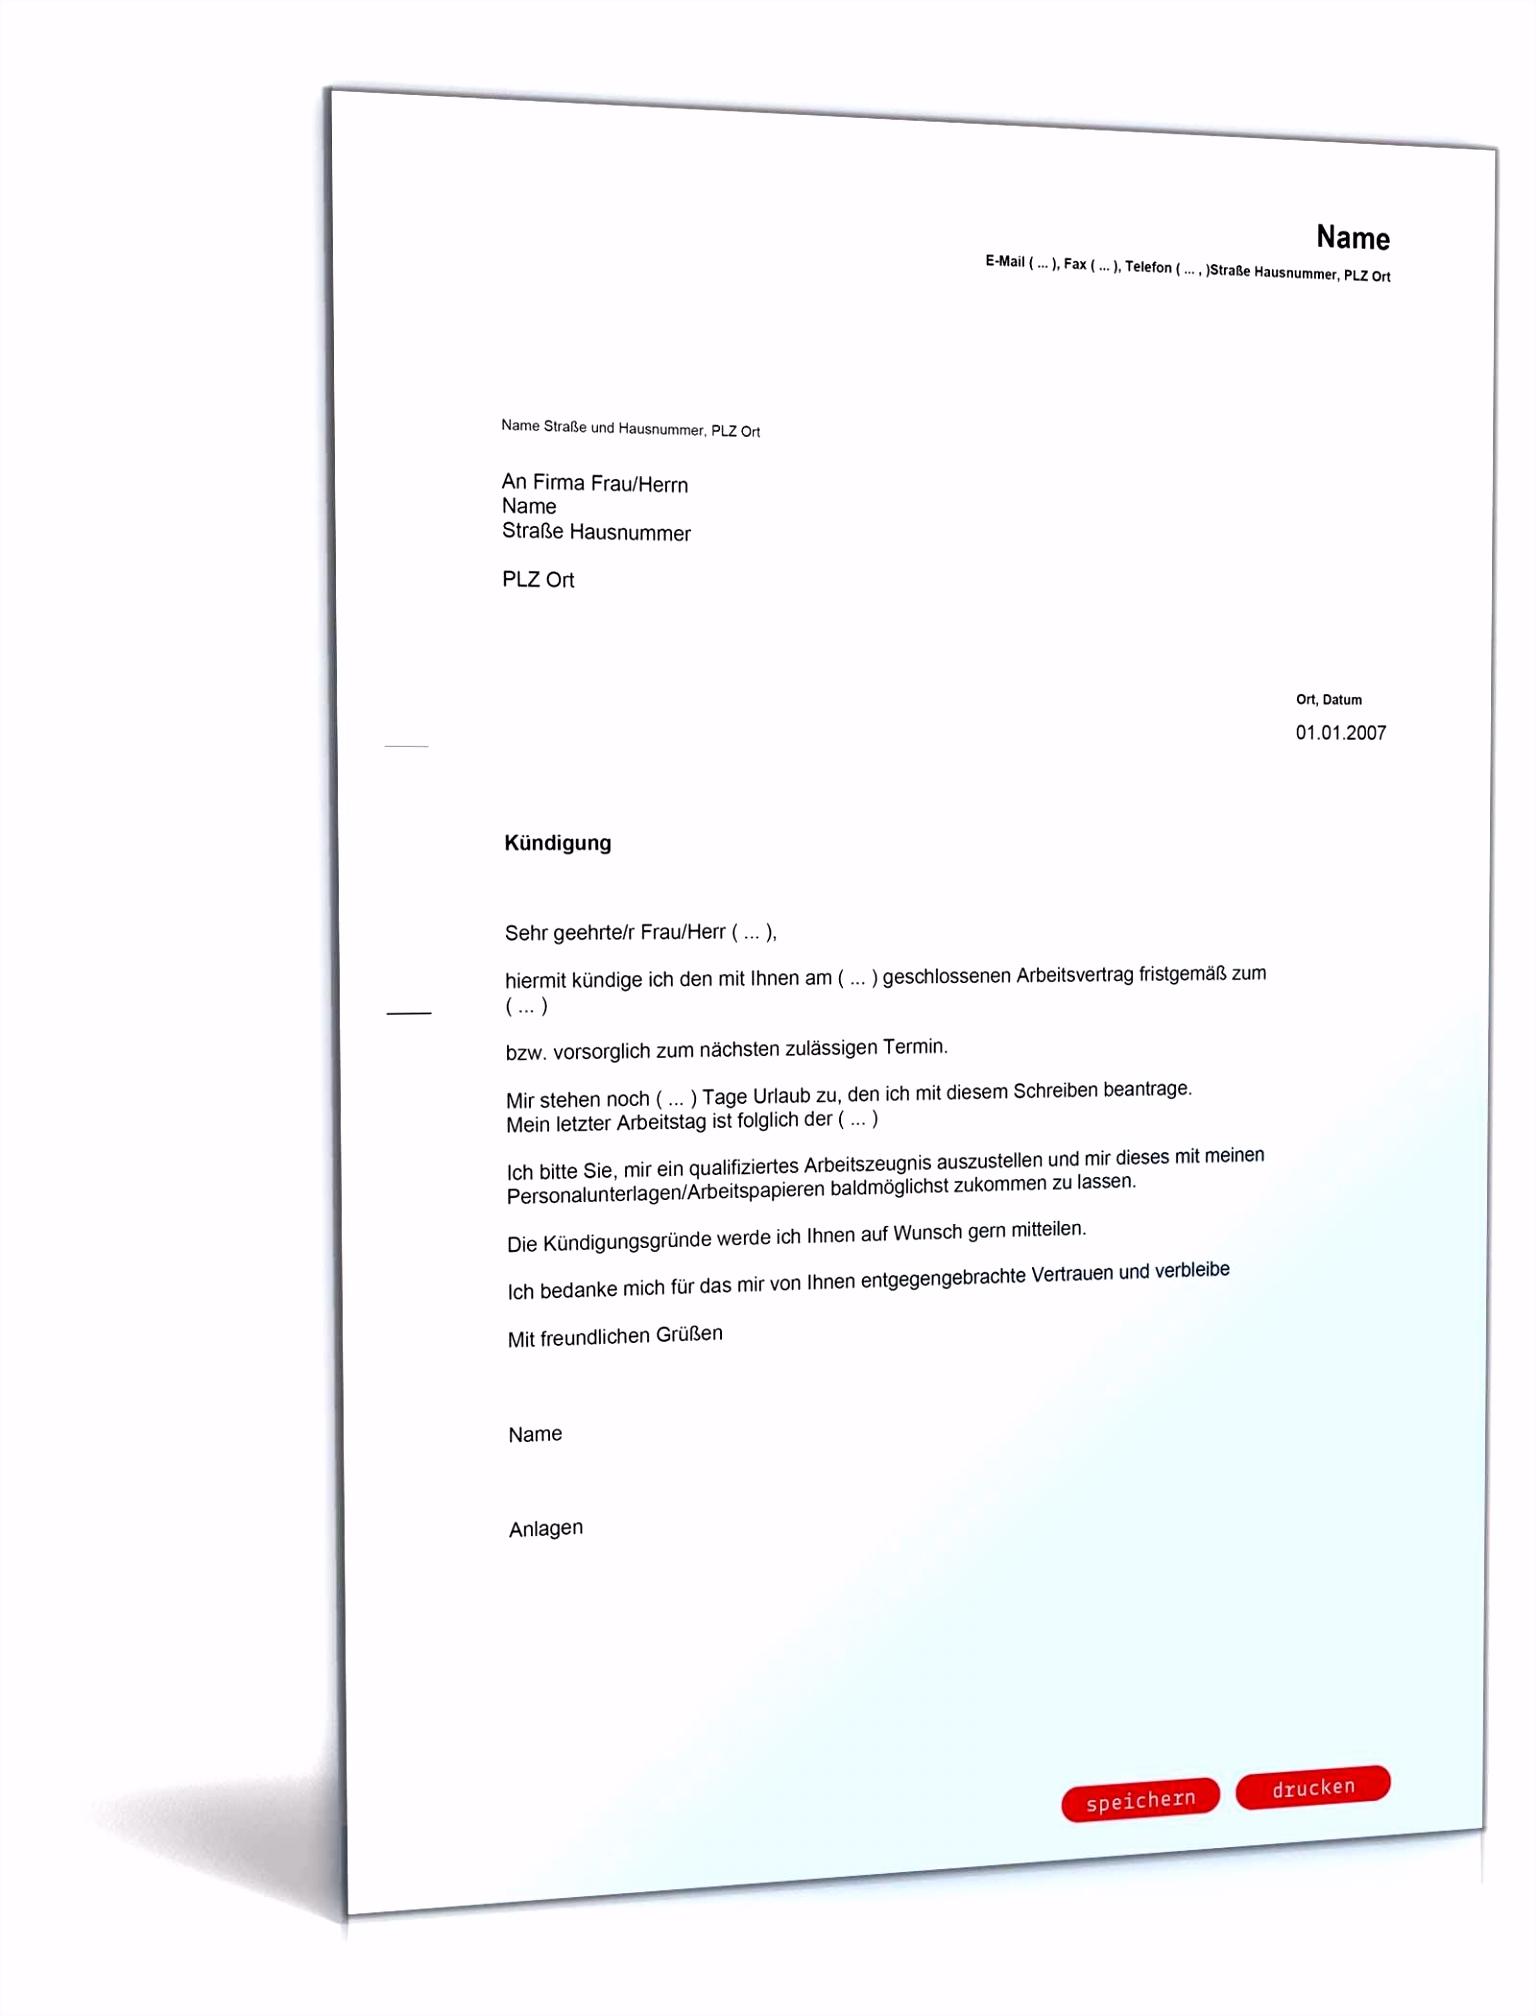 8 450 Euro Job Vertrag Vorlage - SampleTemplatex1234 ...